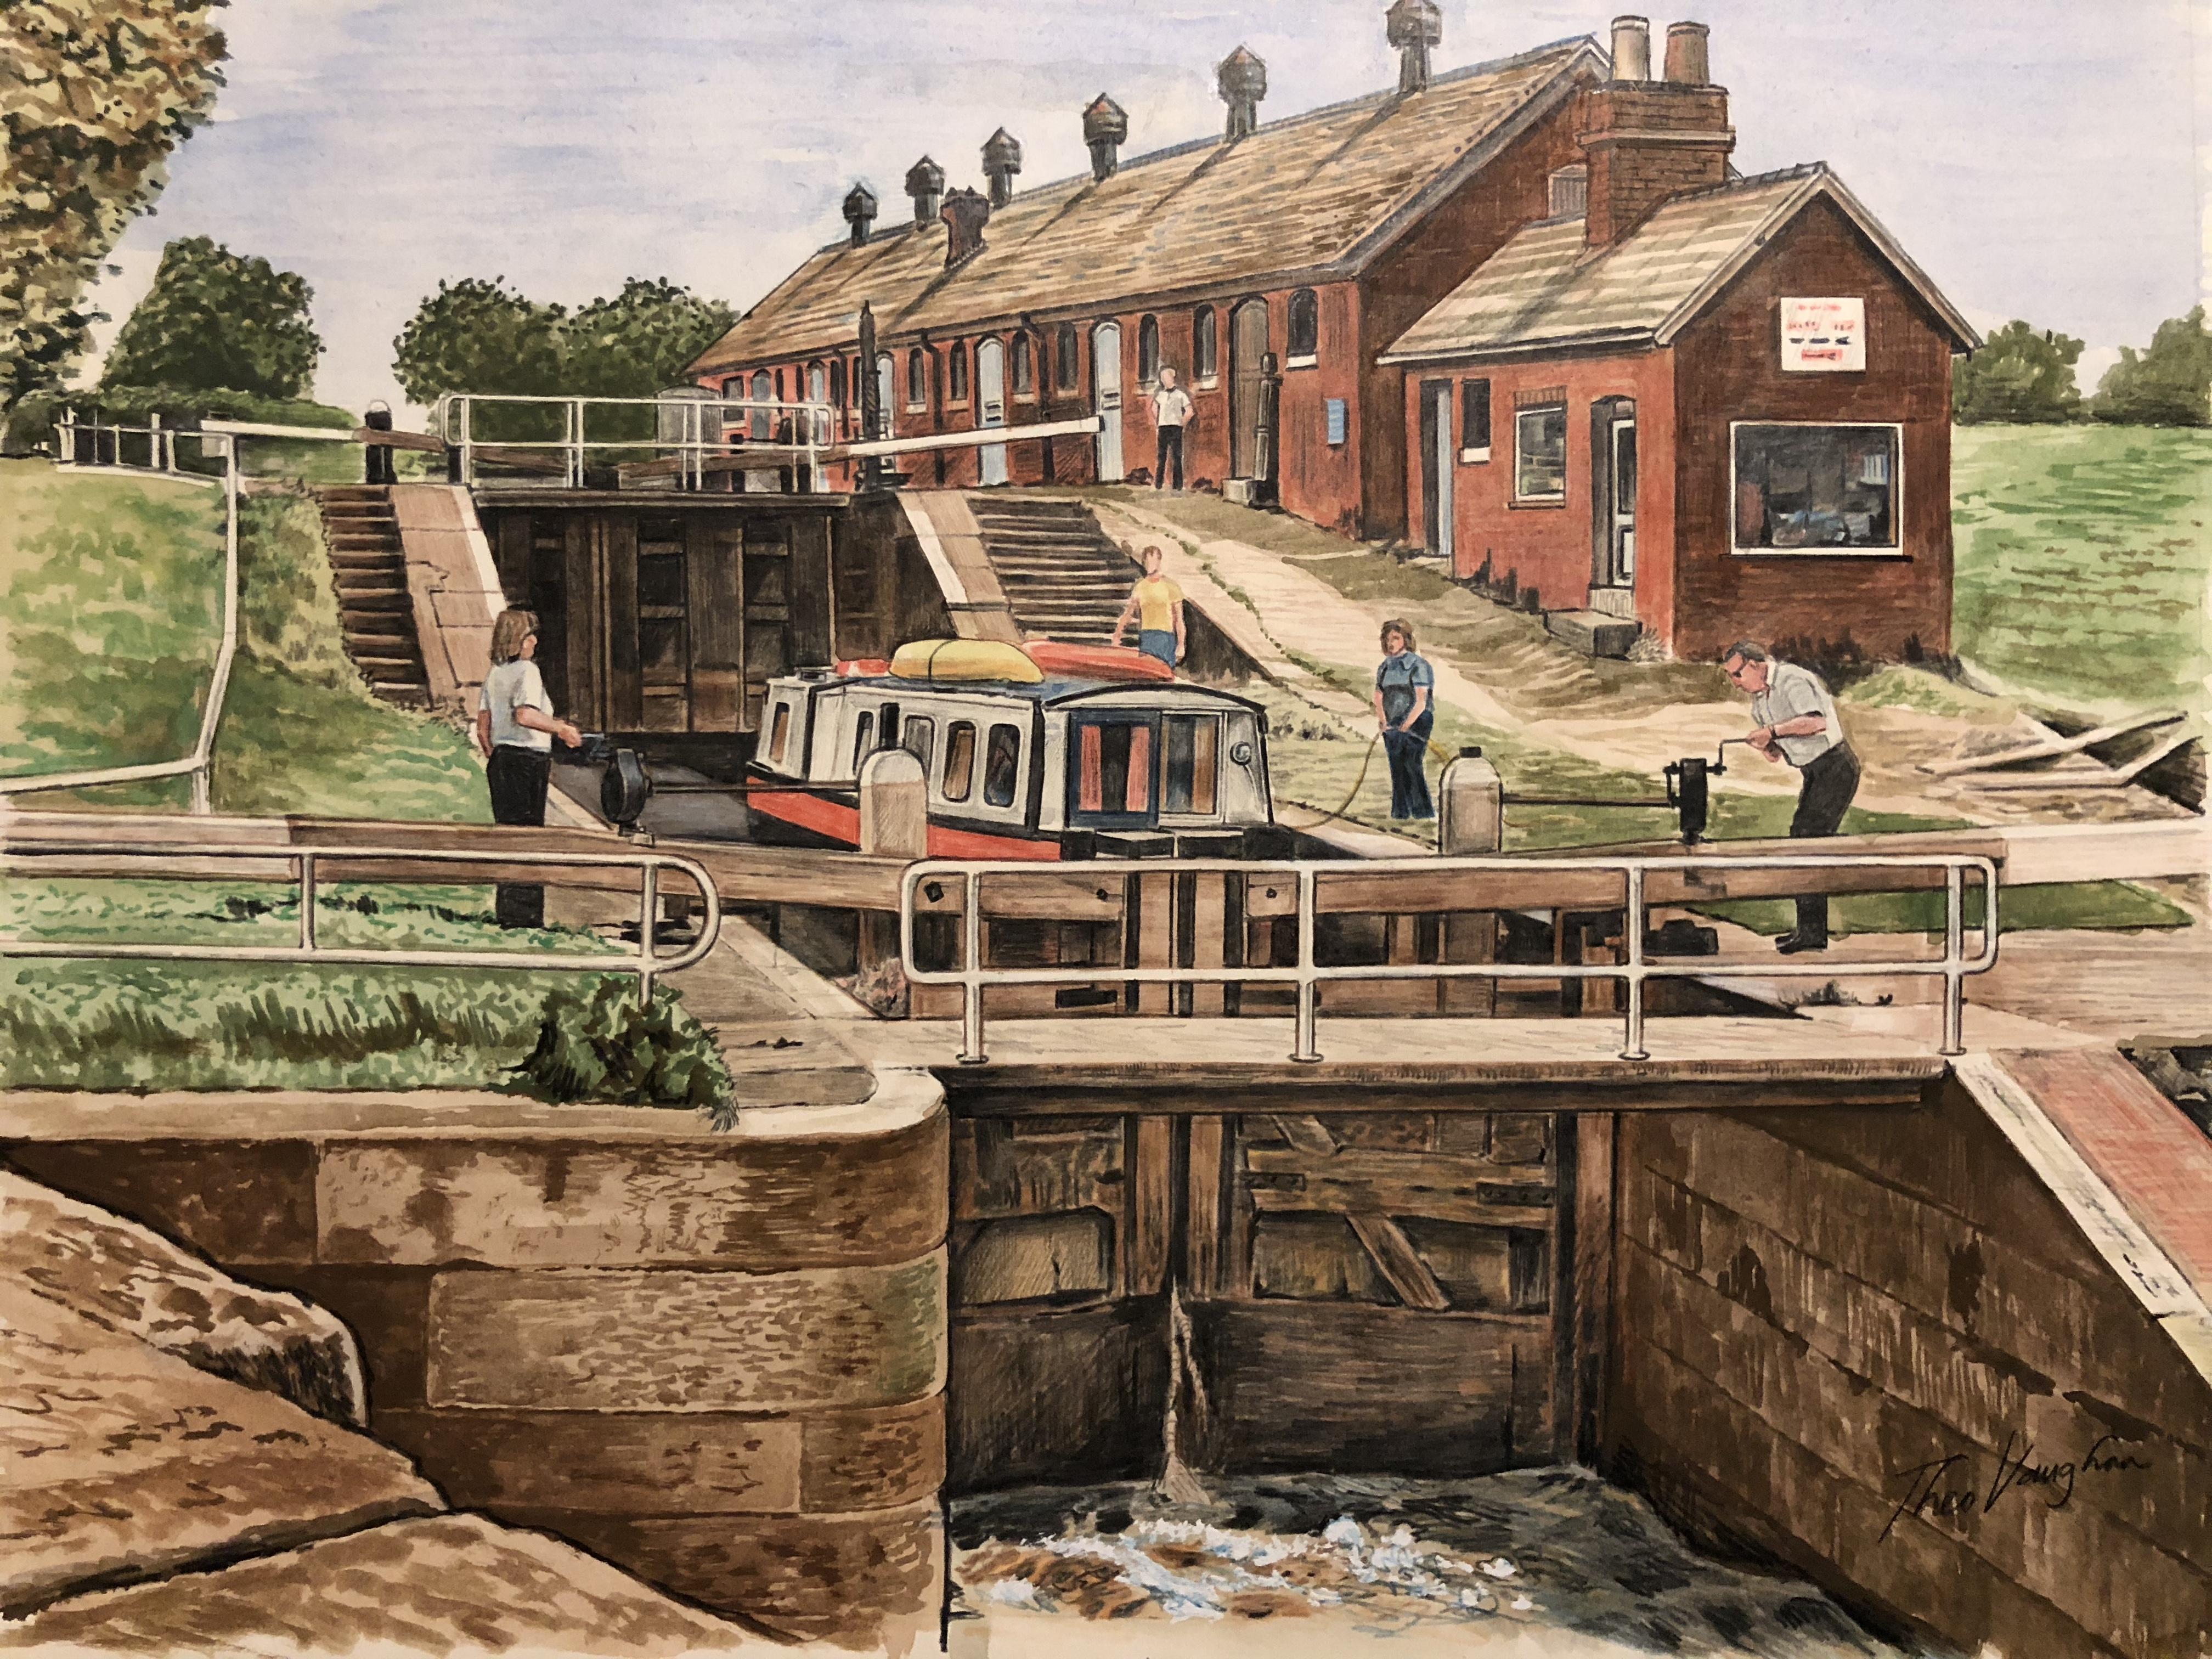 Bunbury Staircase Locks, Shropshire